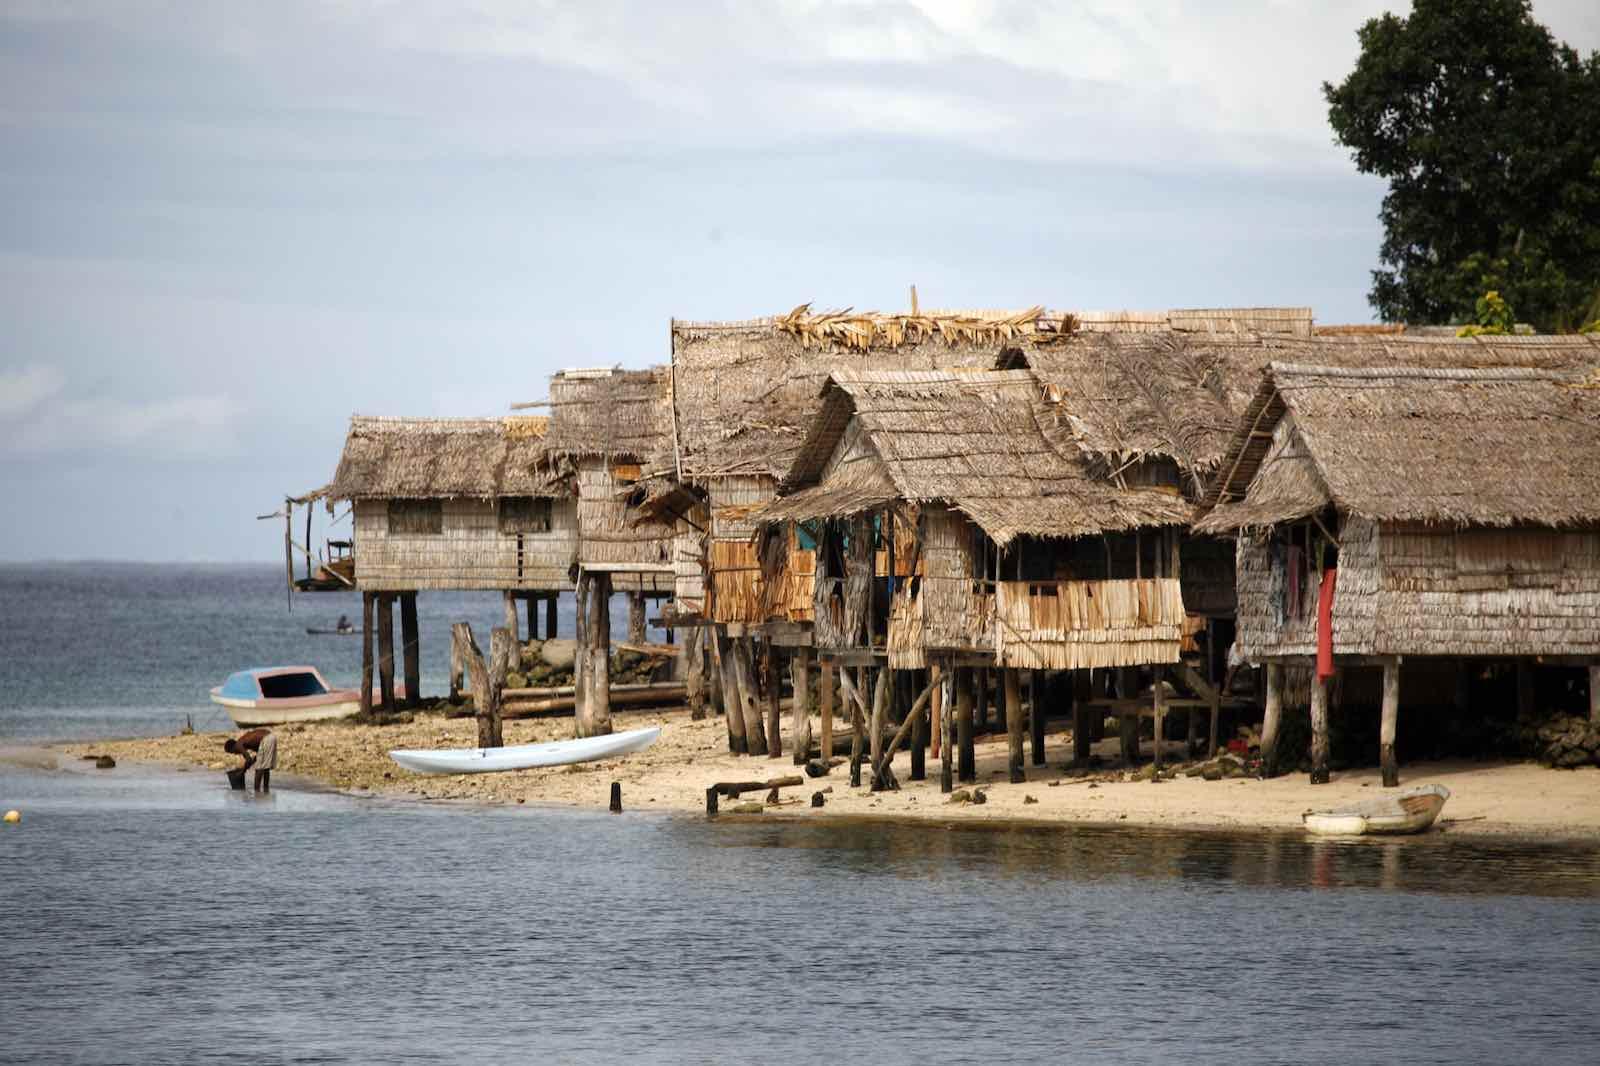 Houses in Auki, Solomon Islands (Photo: Rob Maccoll/DFAT/Flickr)